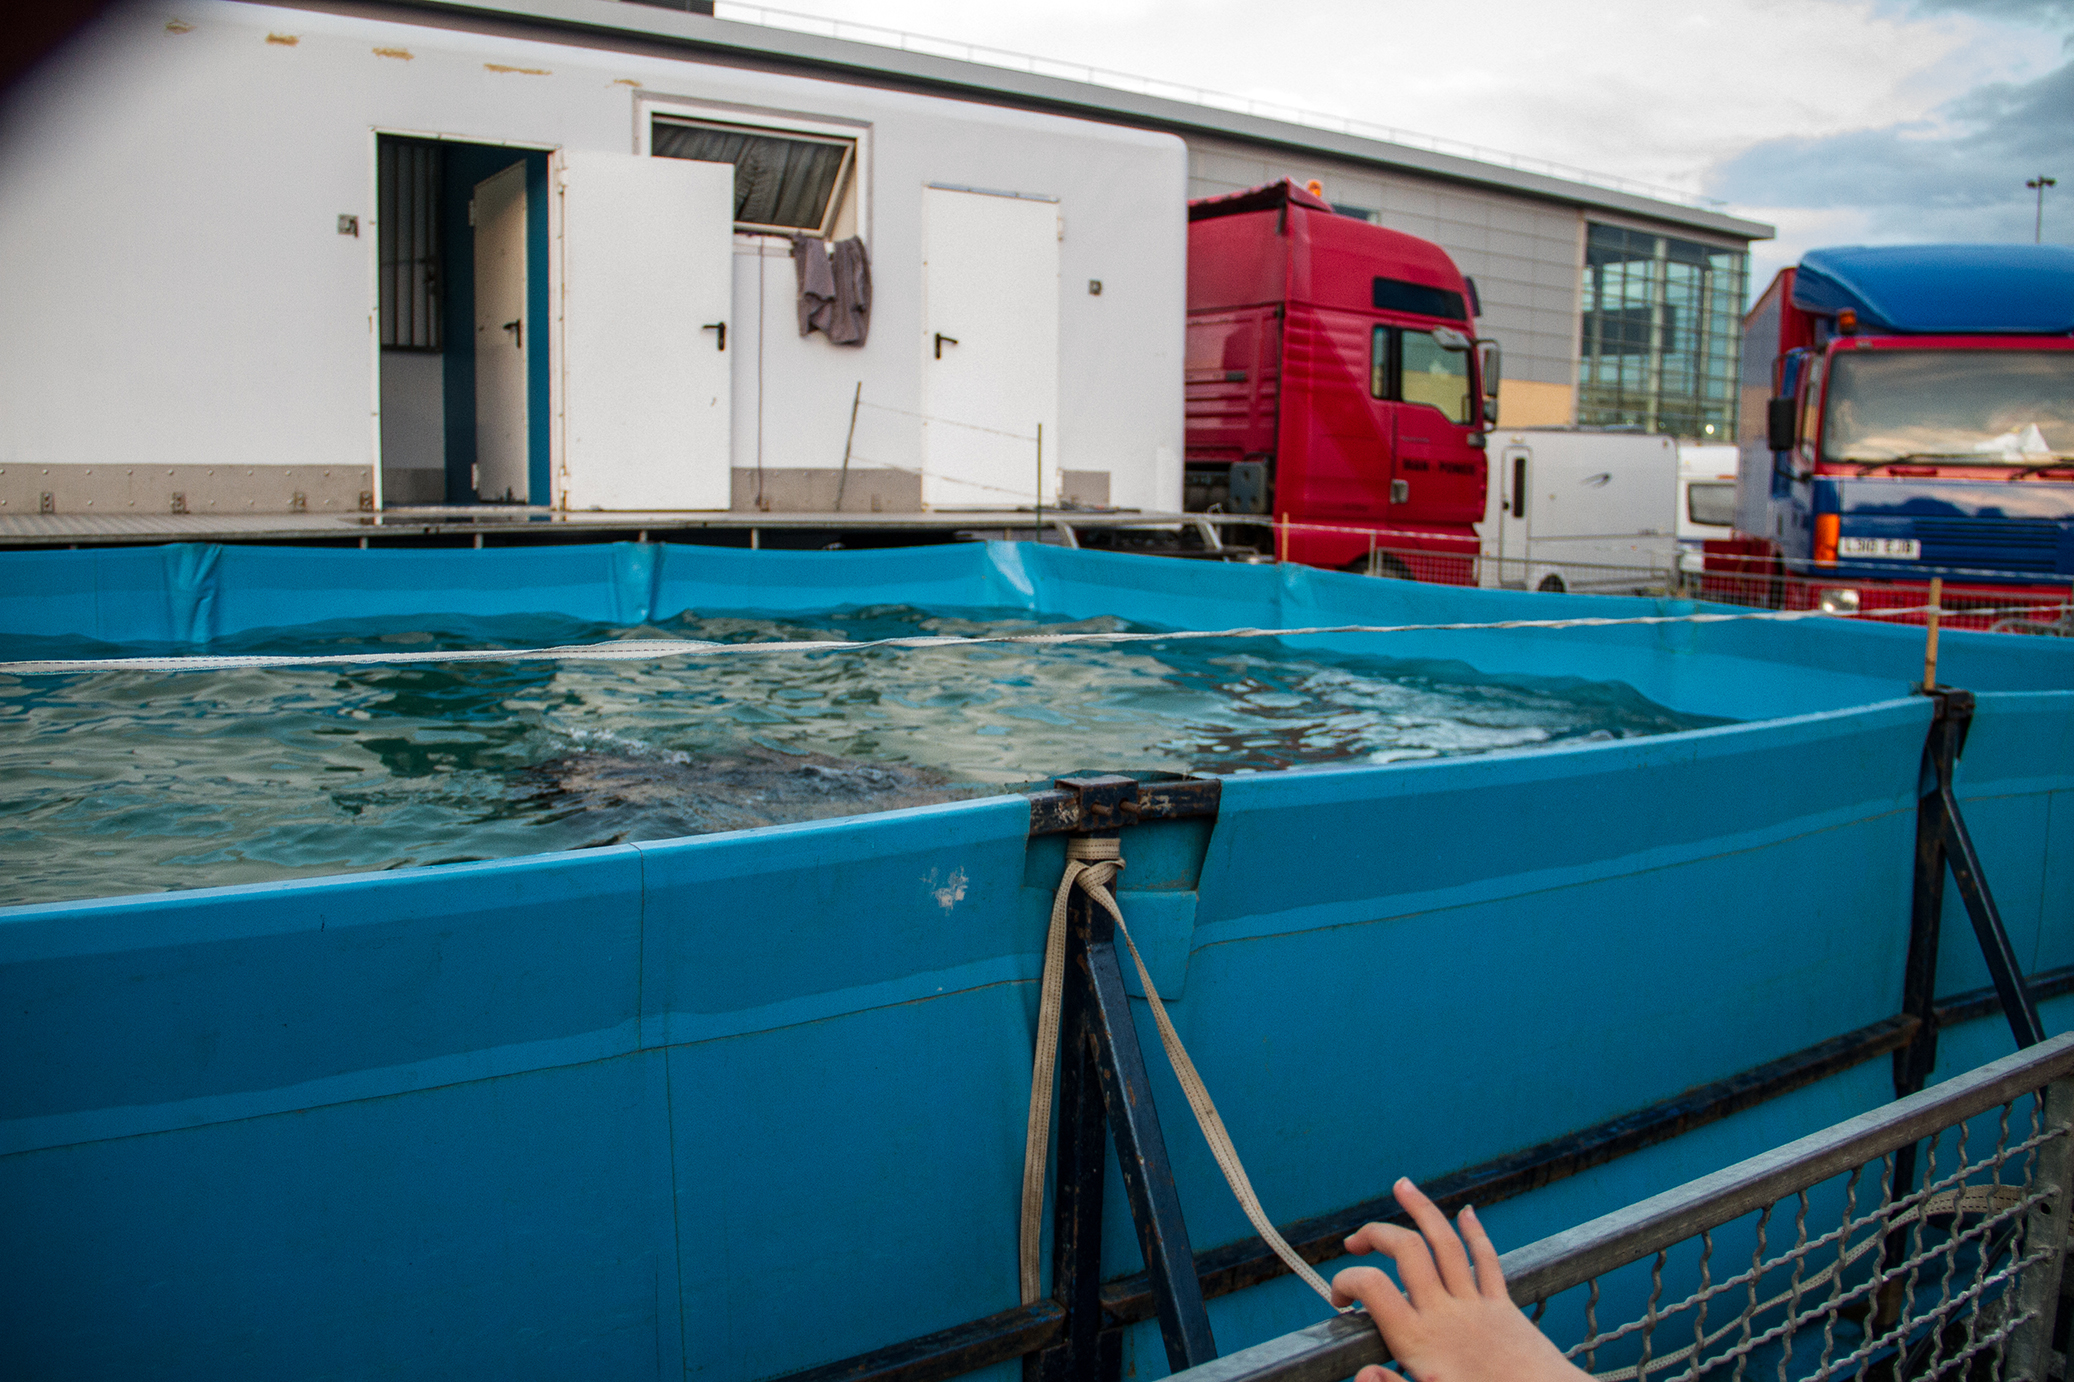 The sea lion pool